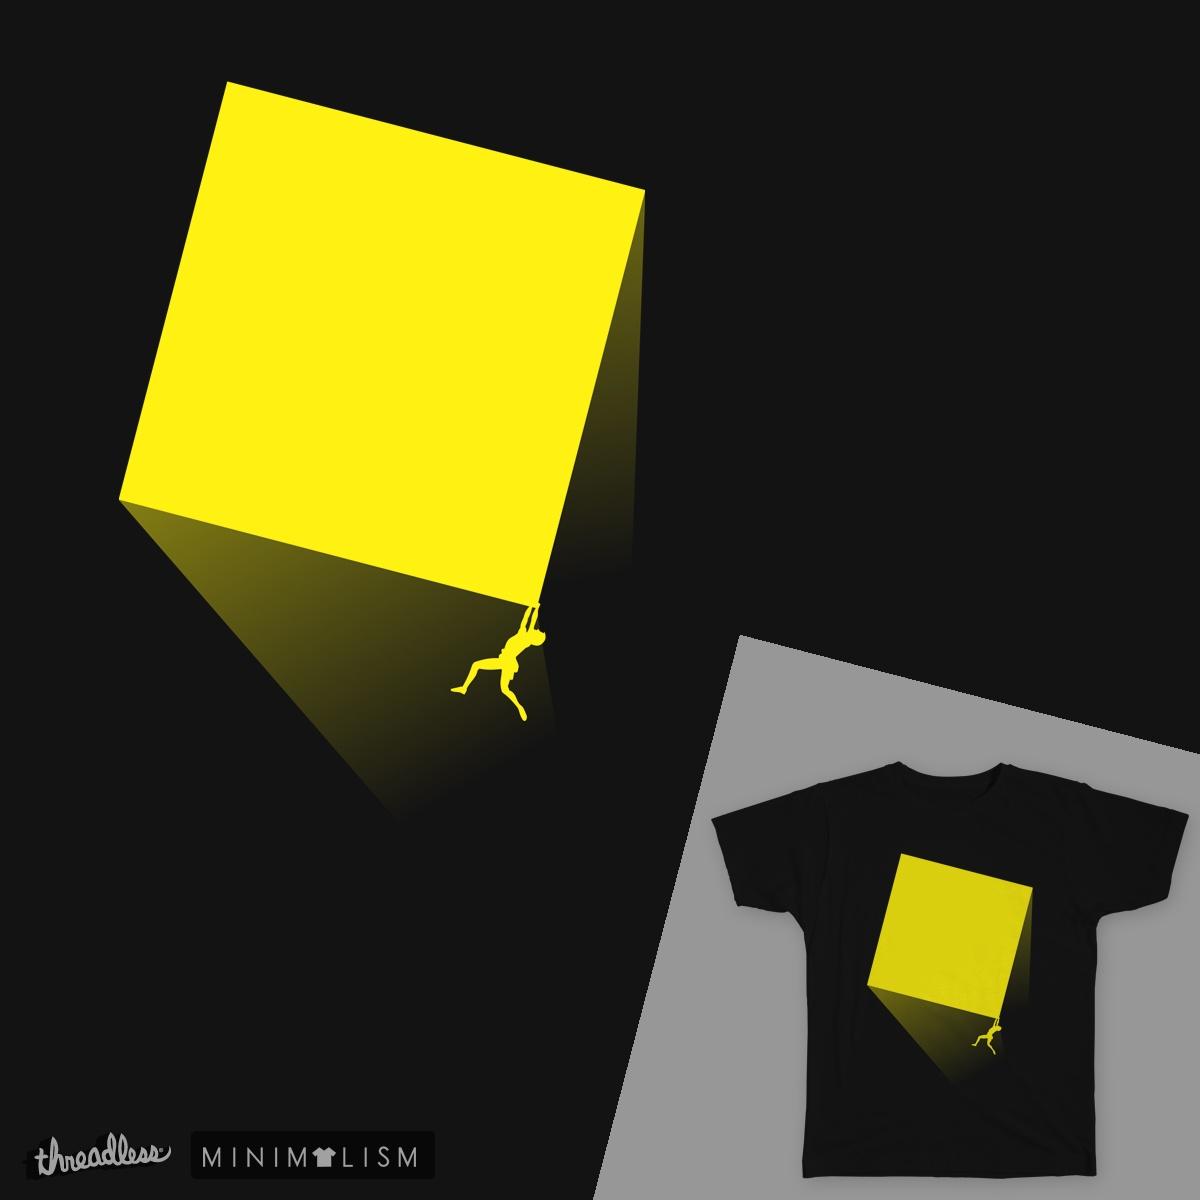 The Box by hornydog on Threadless